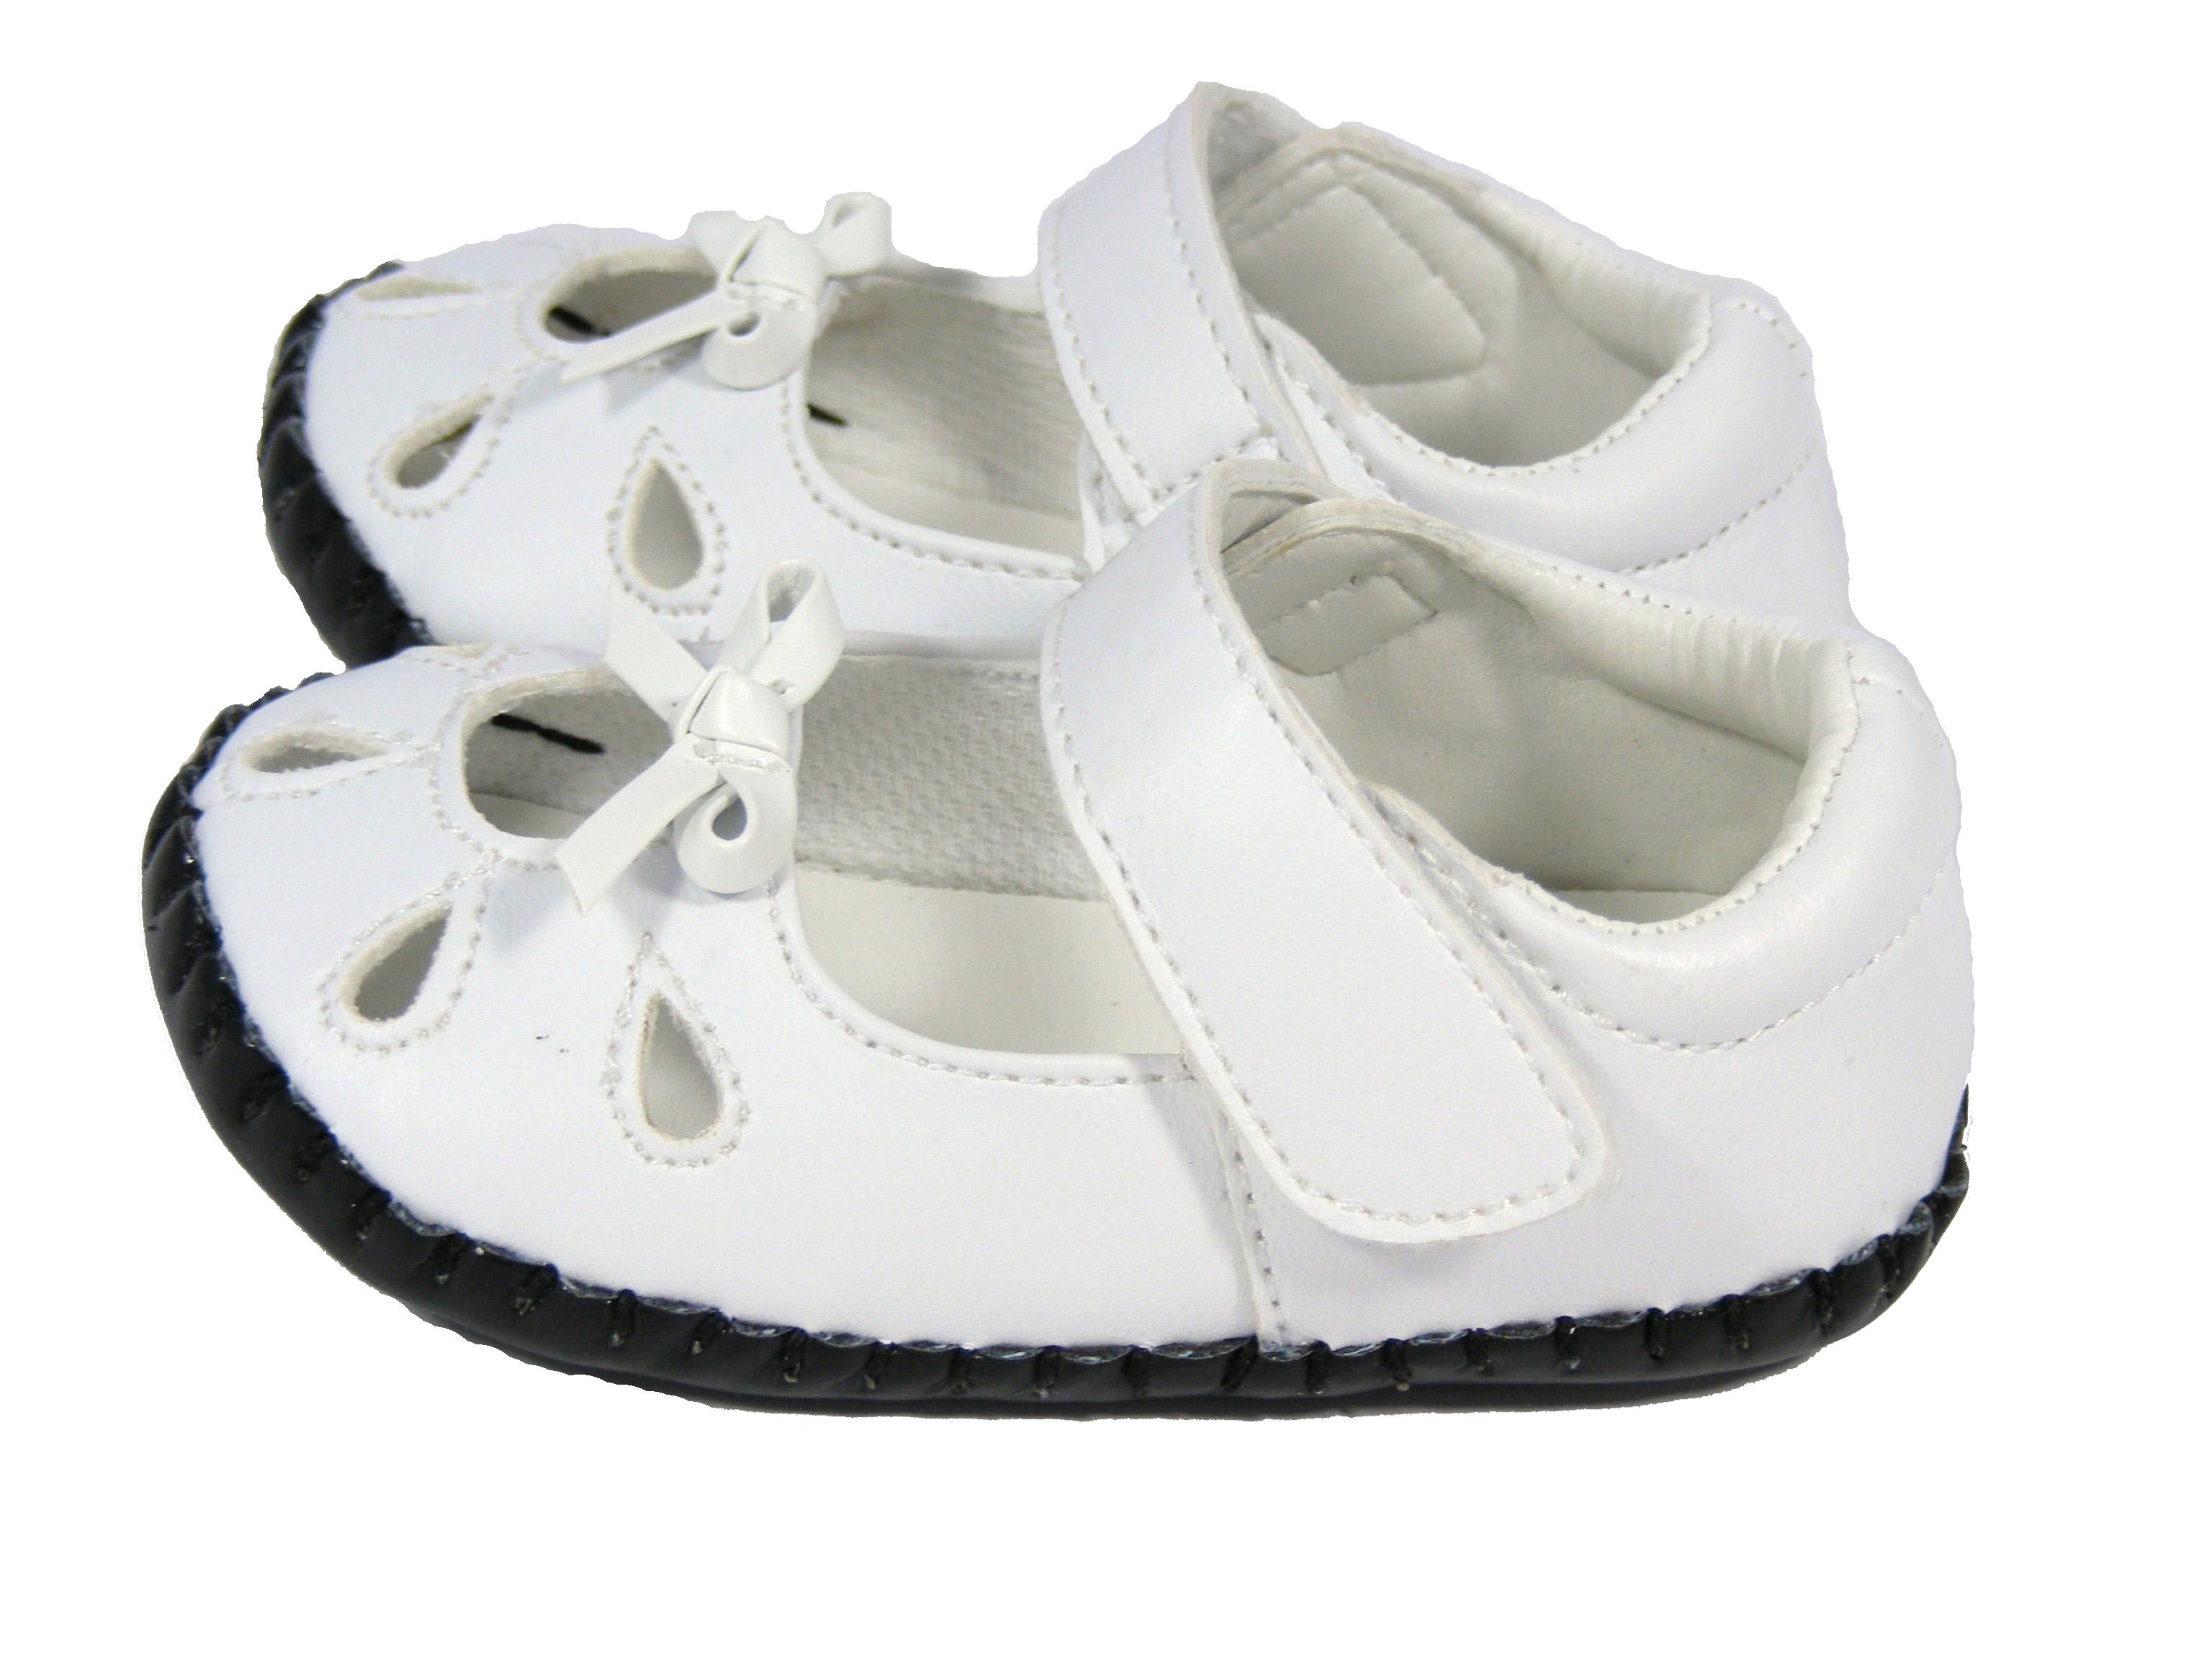 New Baby Infant Toddler Girls White Kiddiflex Sandals Pram ...